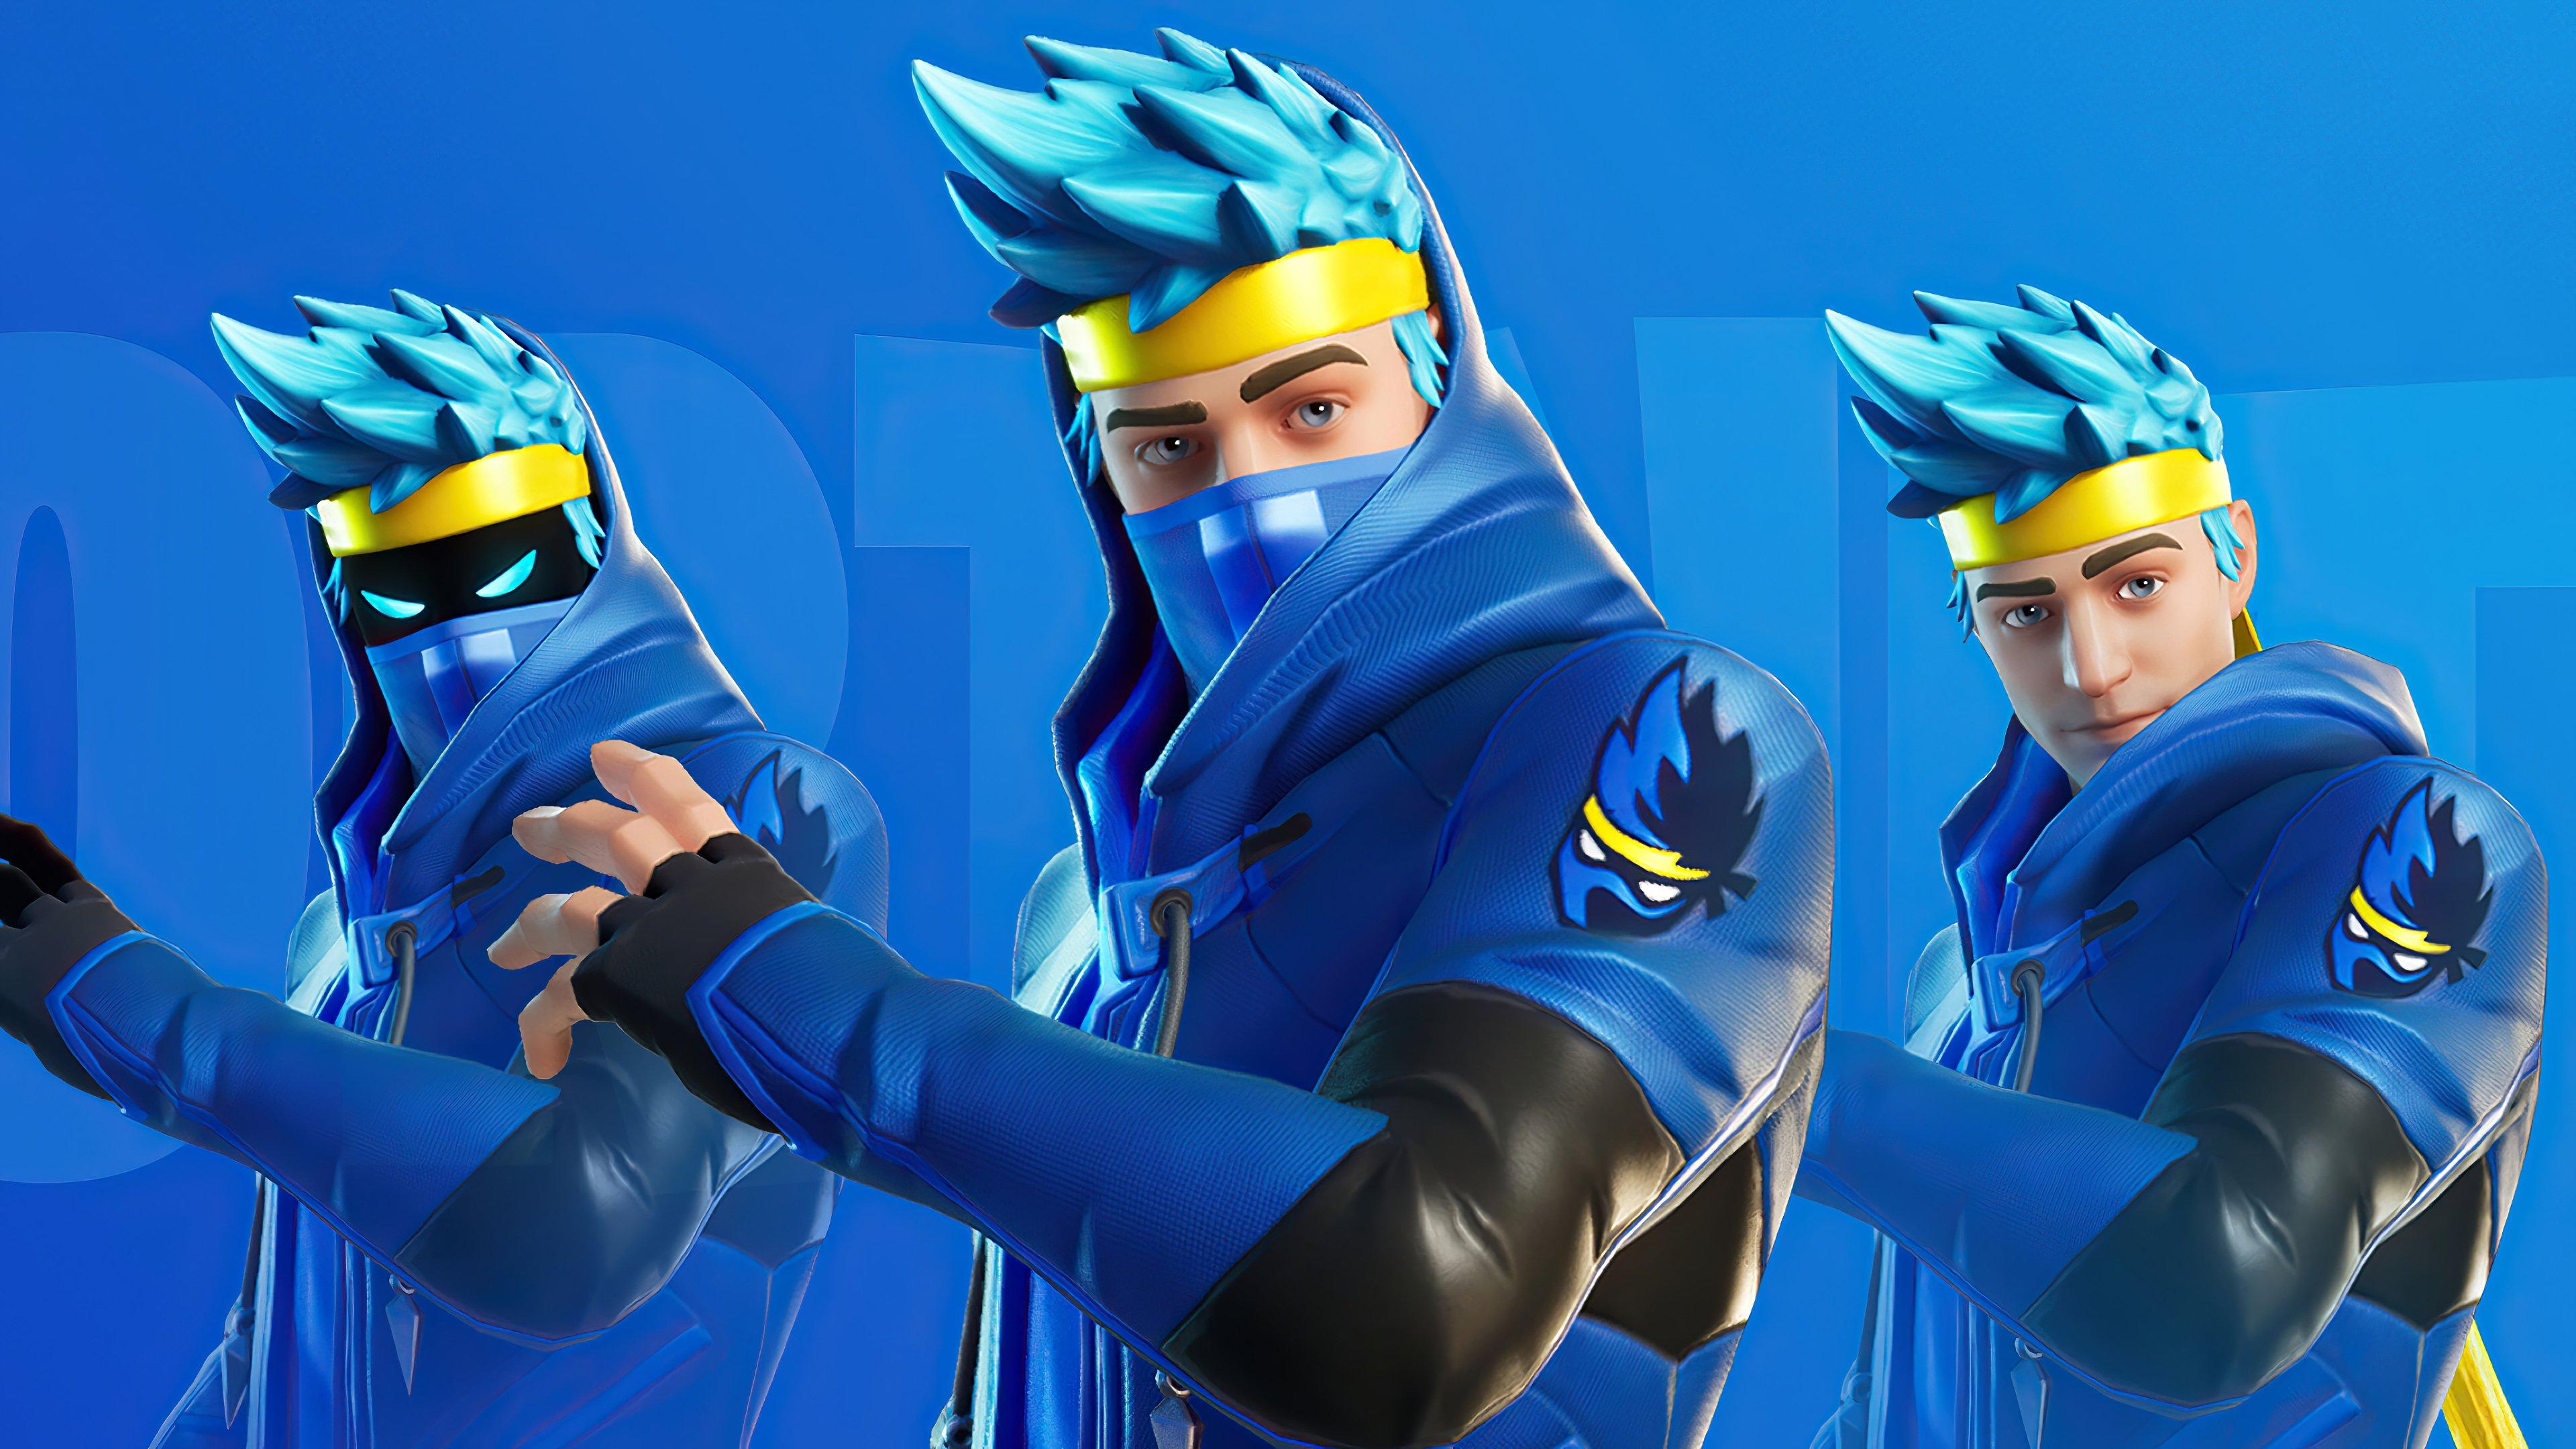 Fondos de pantalla Ninja Fortnite Battle Royale Skin